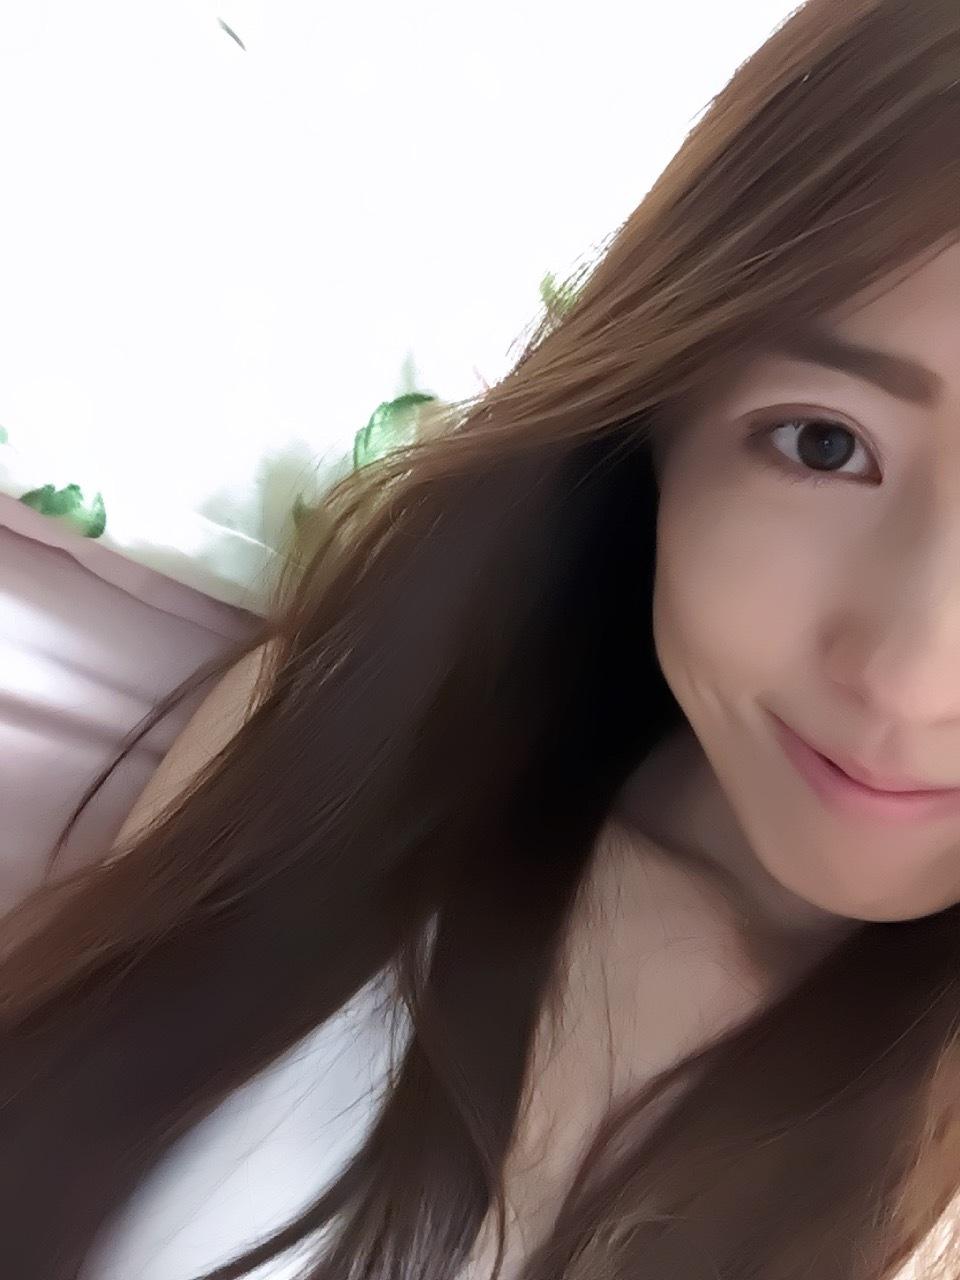 hina07hina - Japanese webcam girl